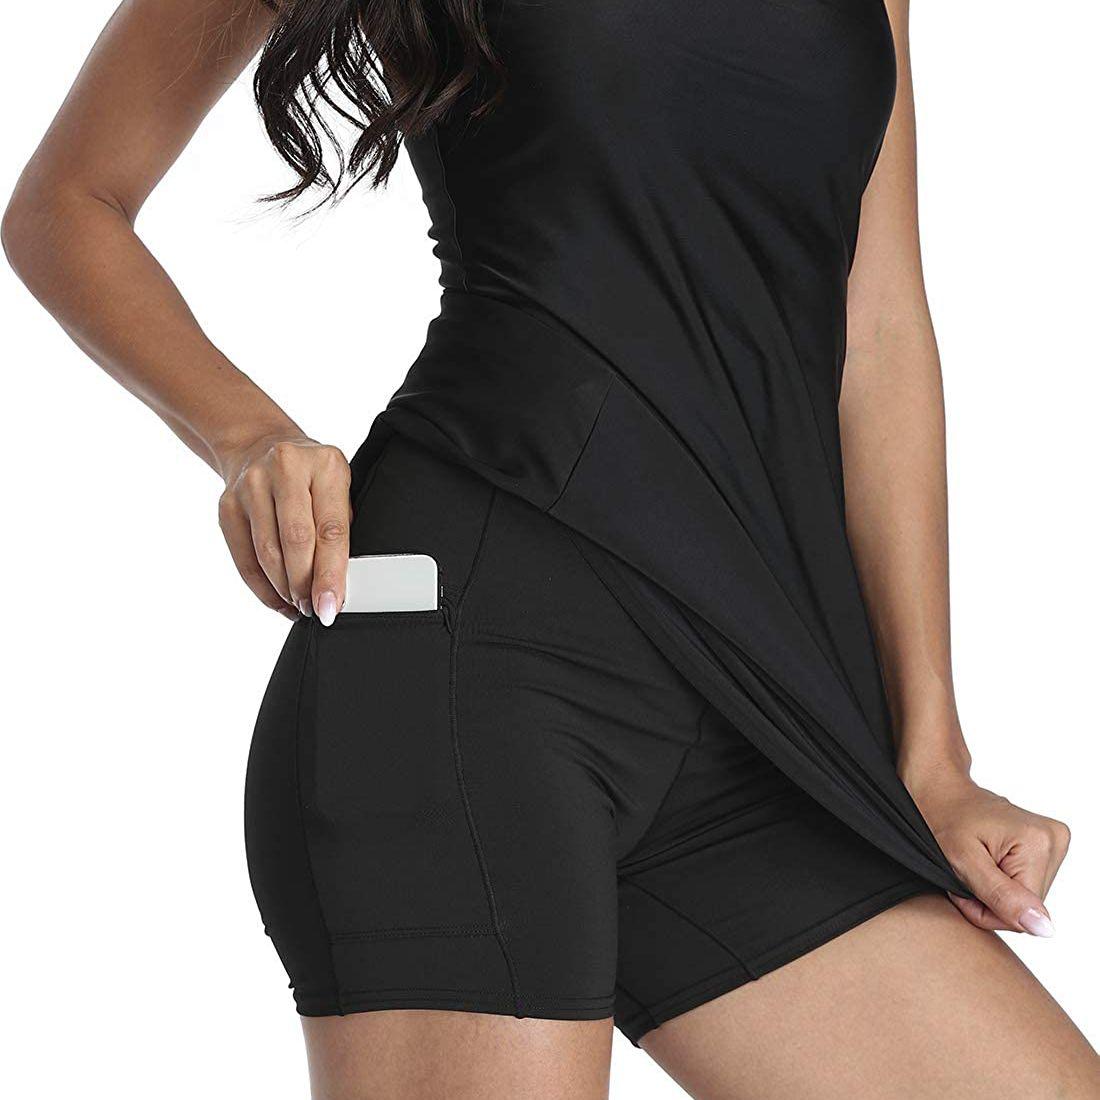 HDE exercise dress